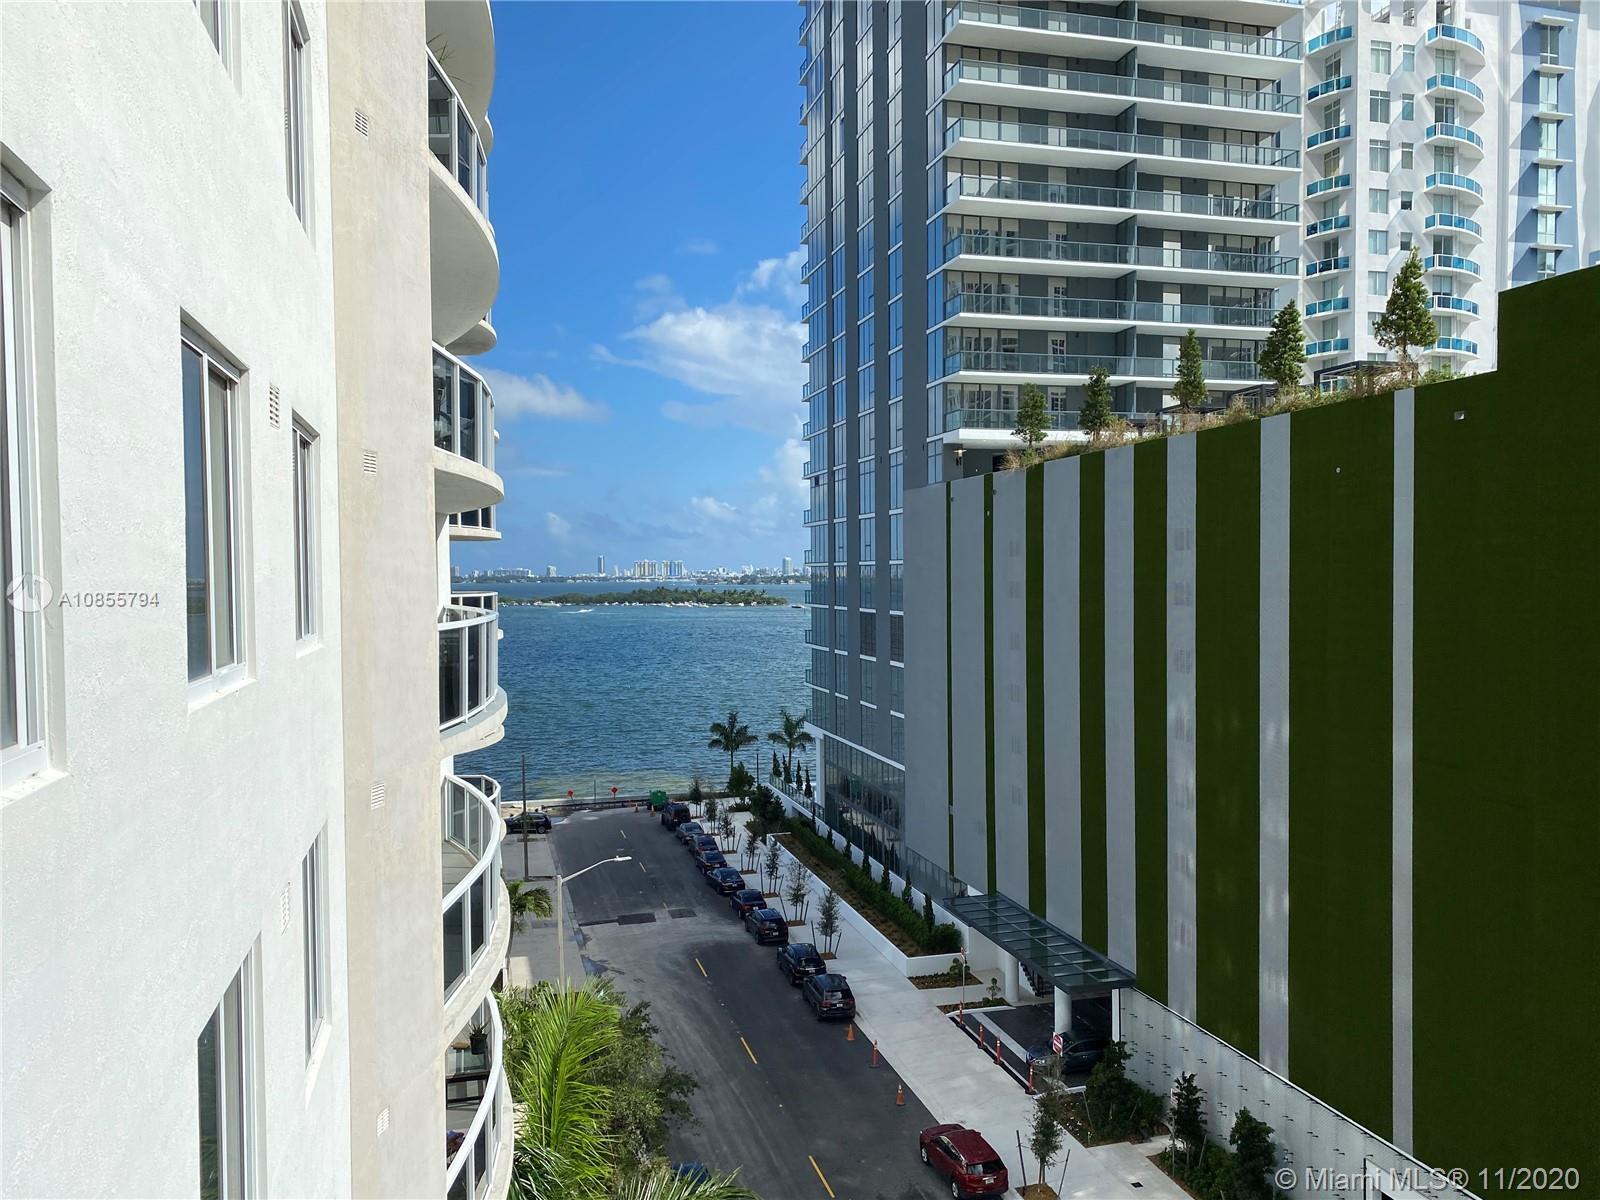 23 Biscayne Bay #805 - 601 NE 23rd St #805, Miami, FL 33137